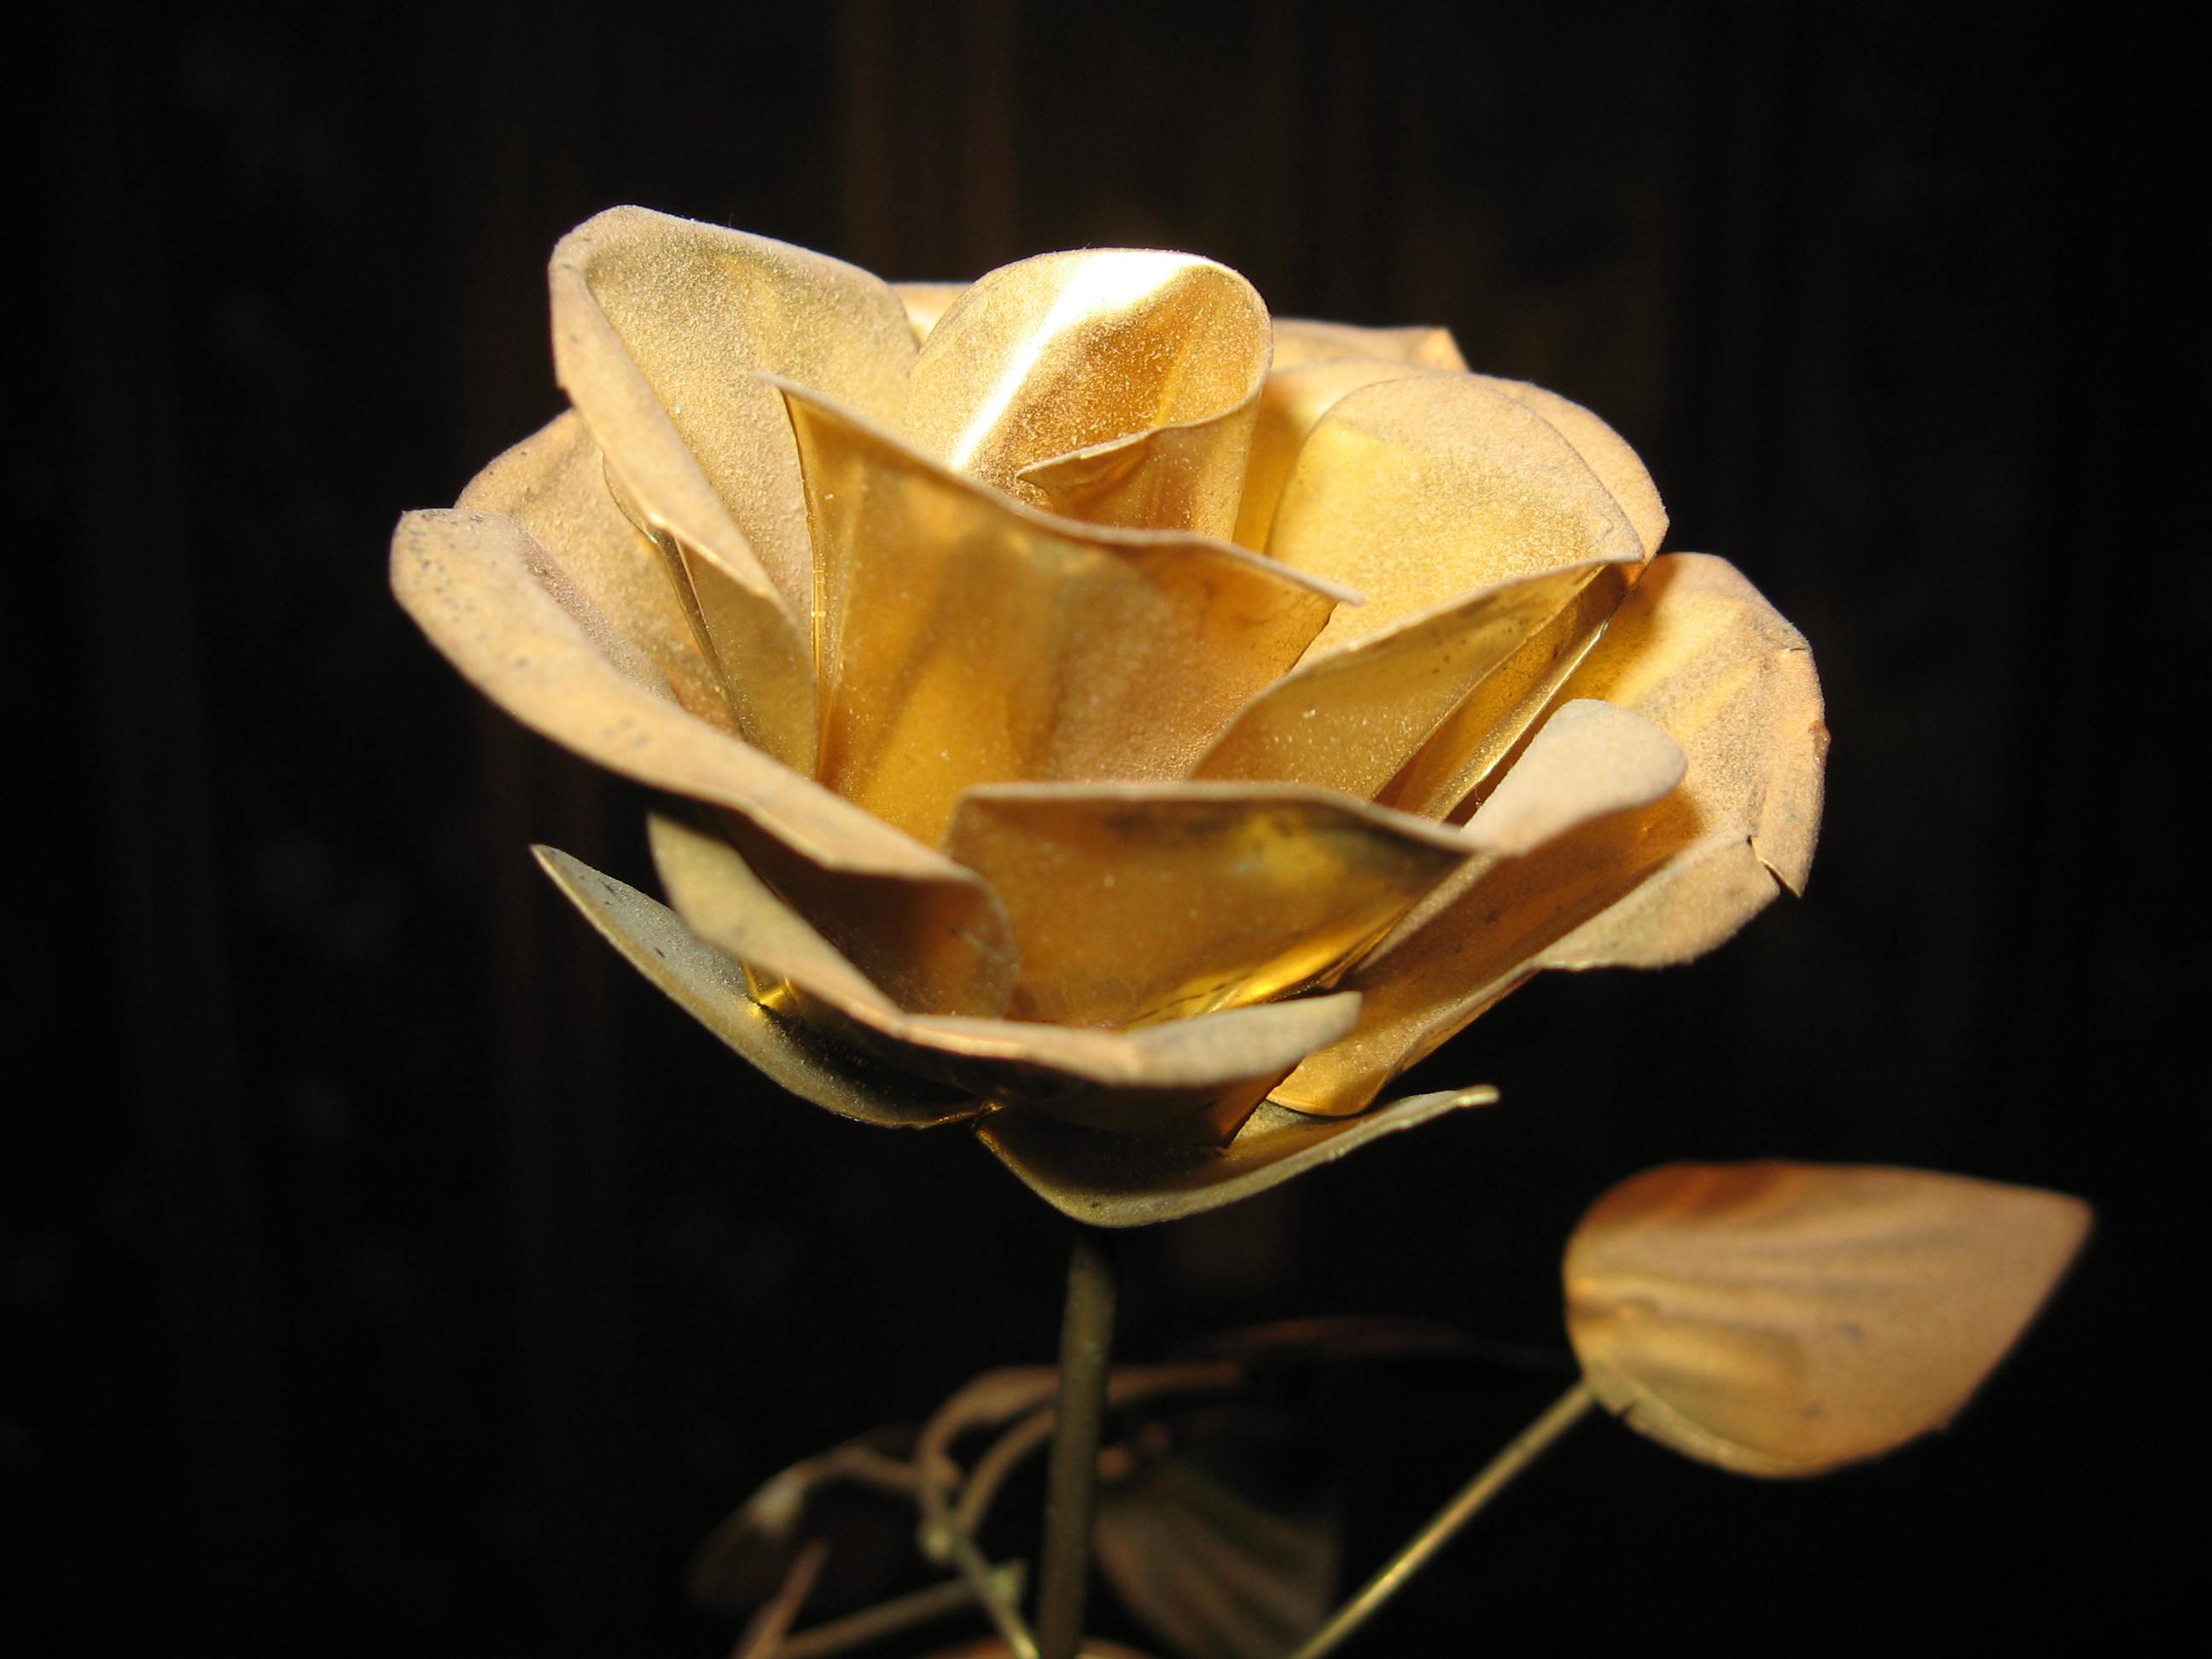 [96+] Gold Rose Wallpapers on WallpaperSafari